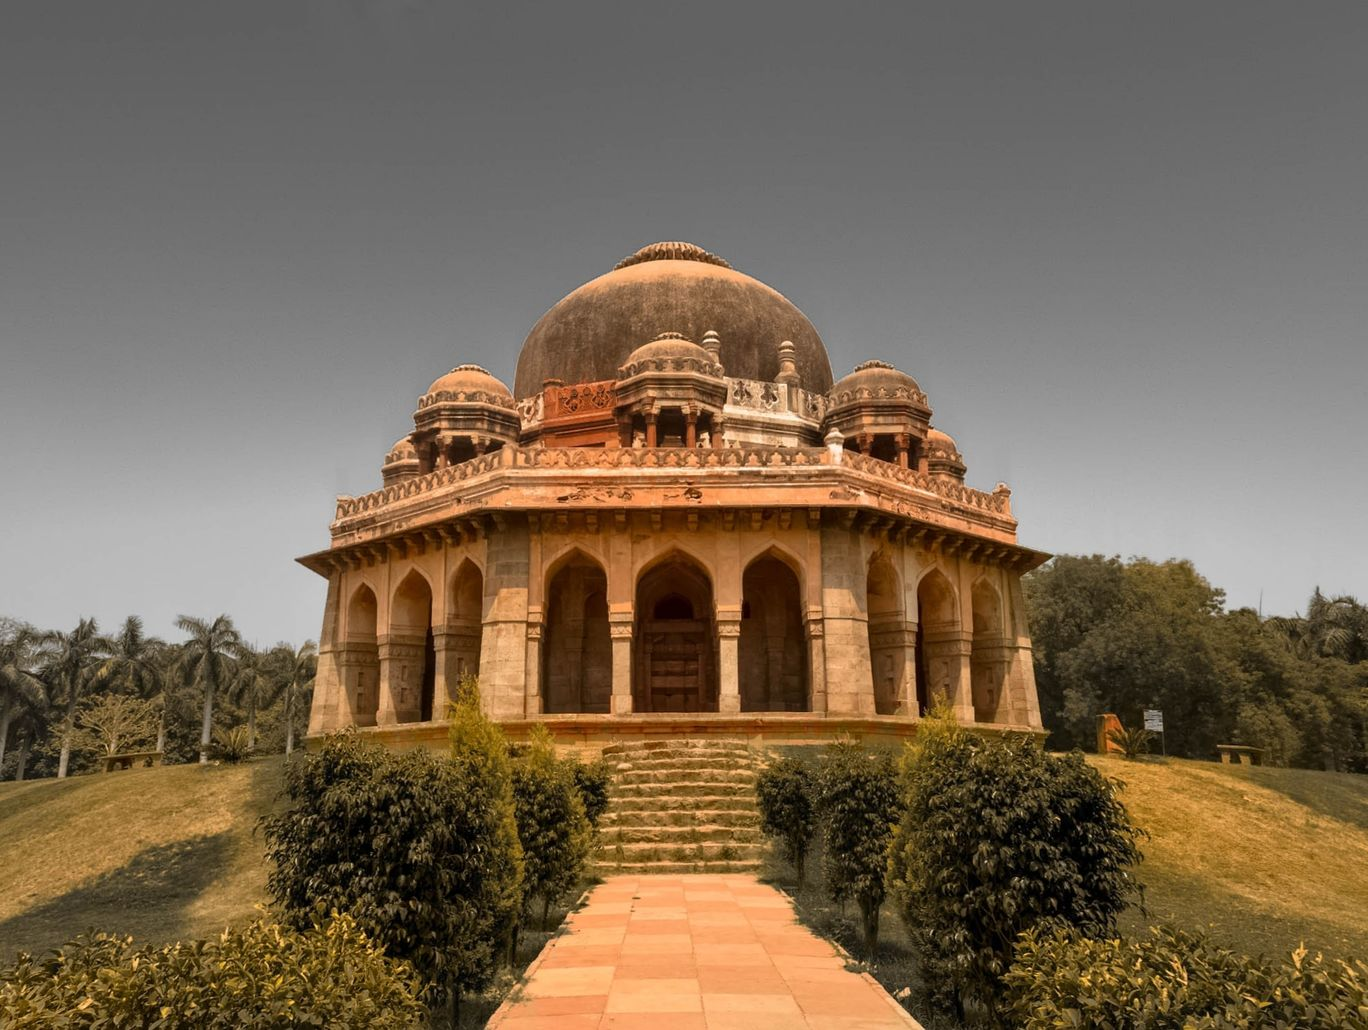 Photo of Muhammad Shah Sayyid Tomb By Biswajeet Panda